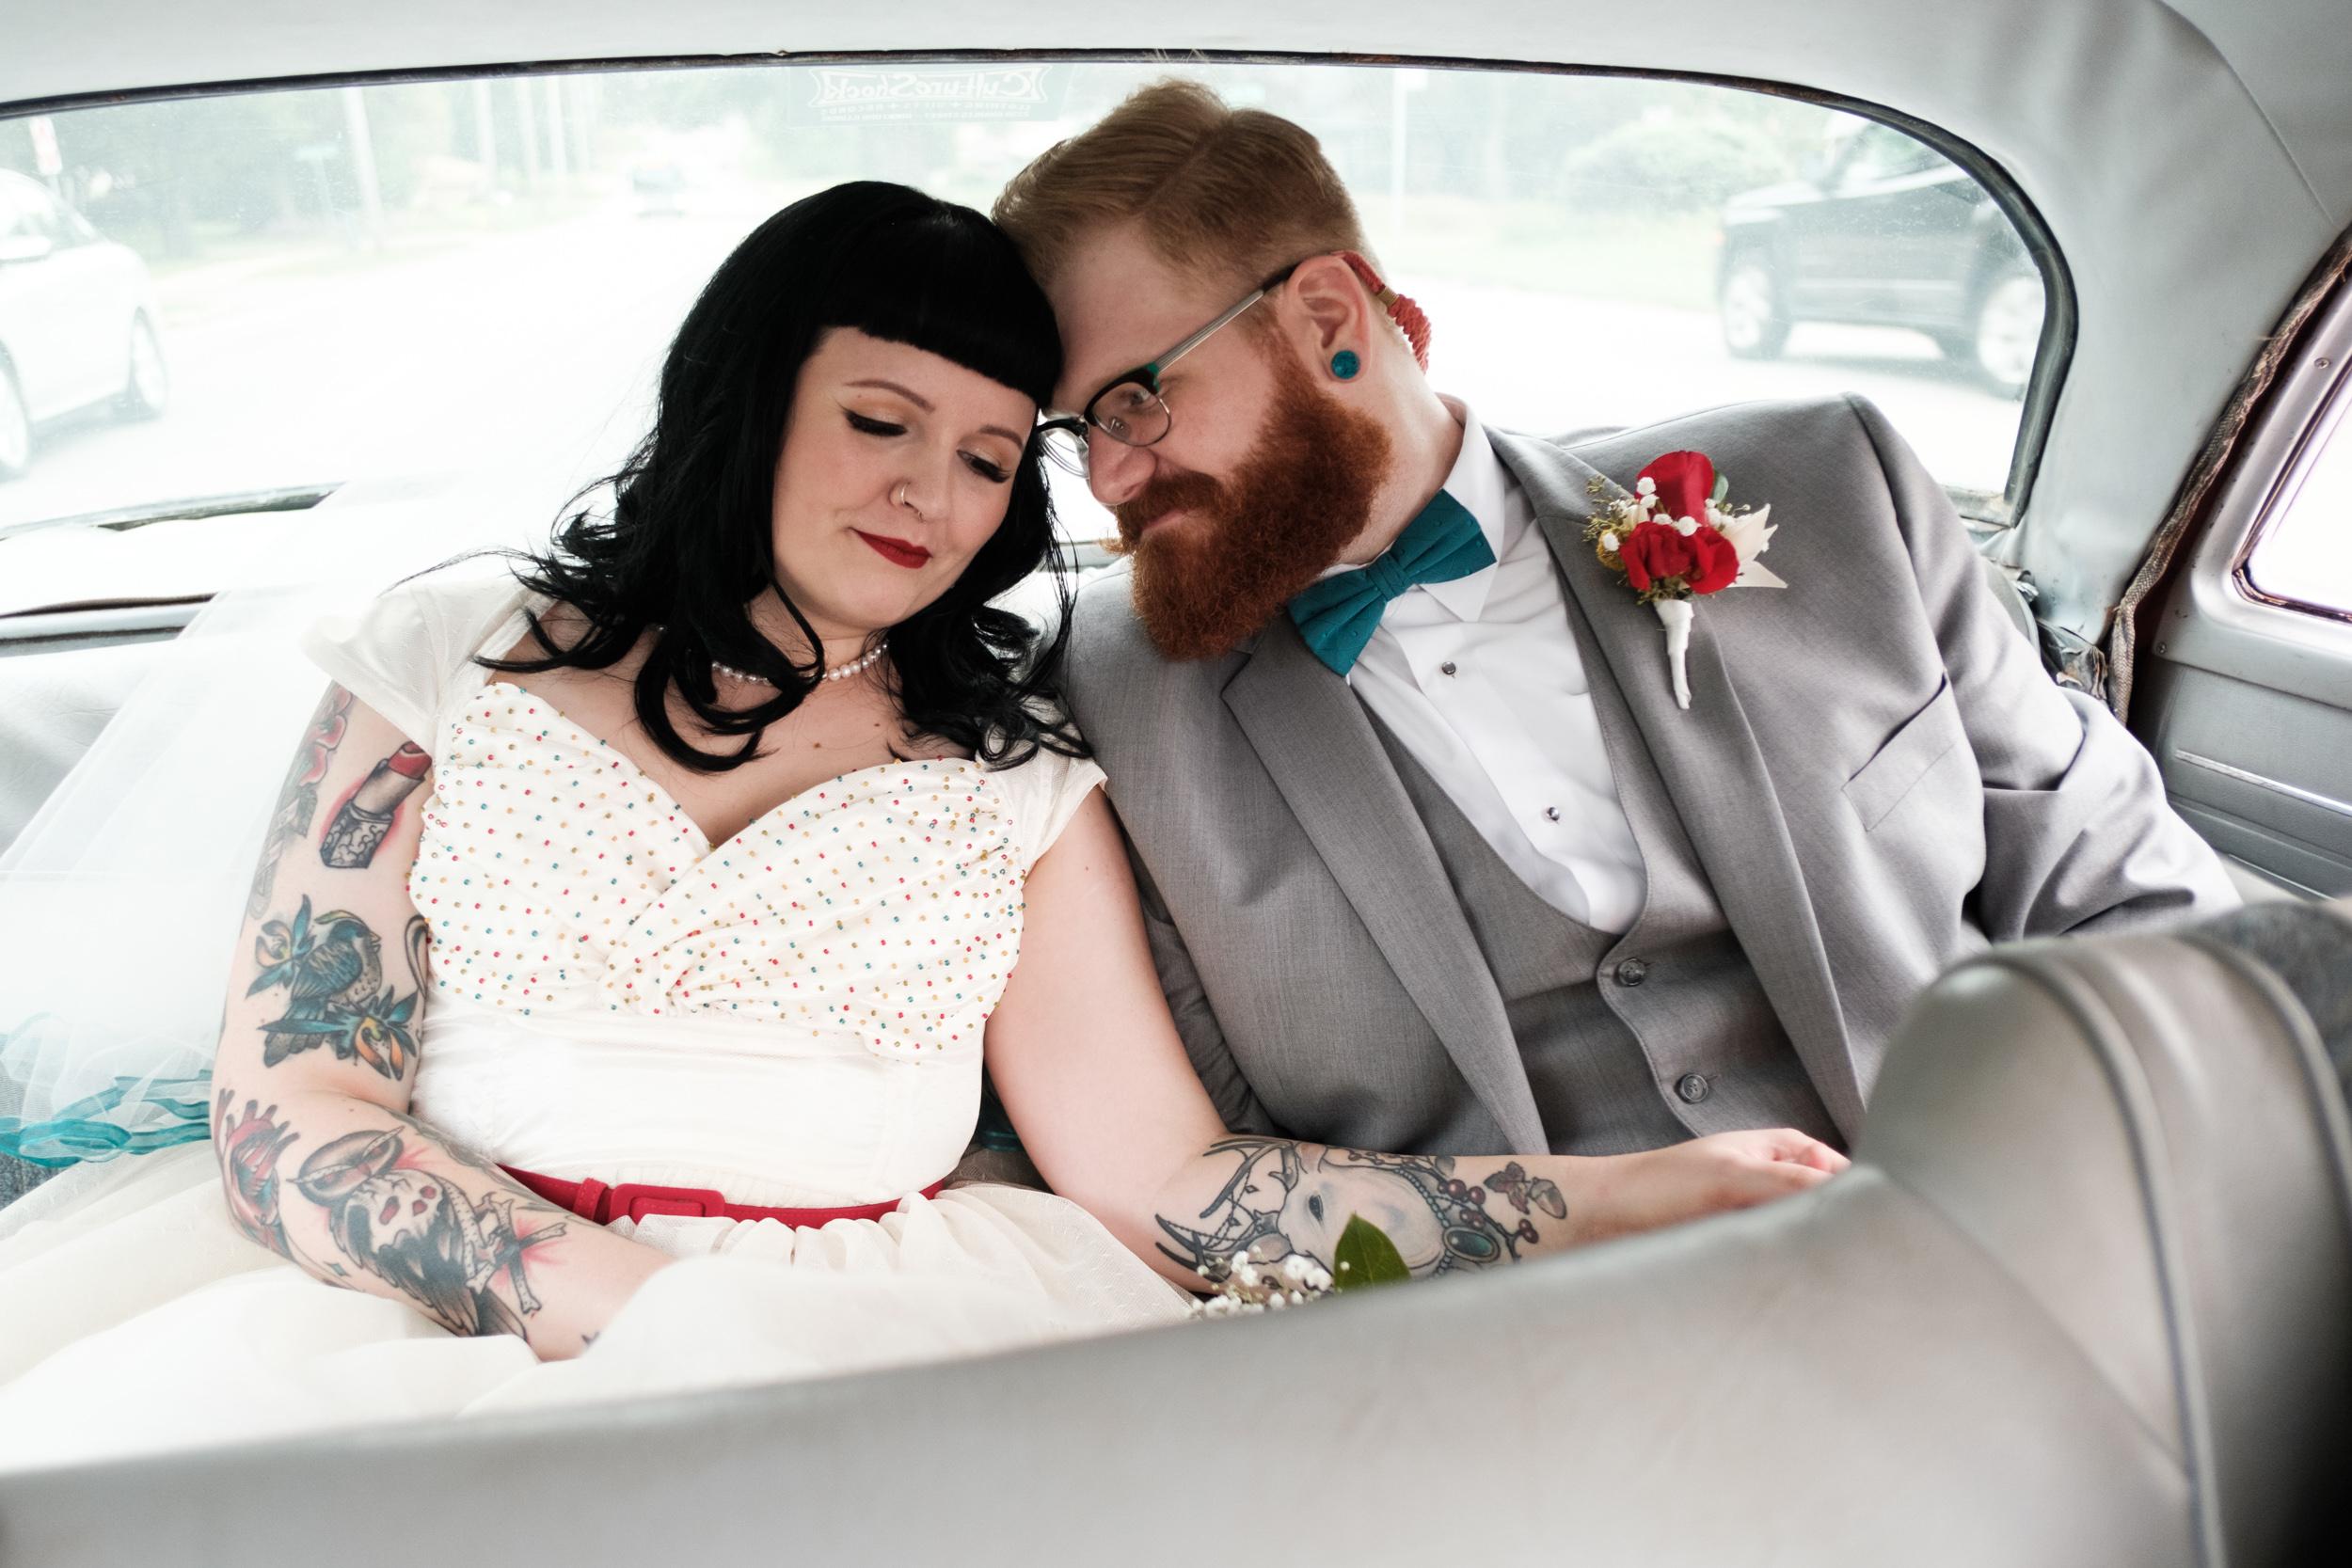 Christian & Sarah wedding photography by Brian milo-187.jpg